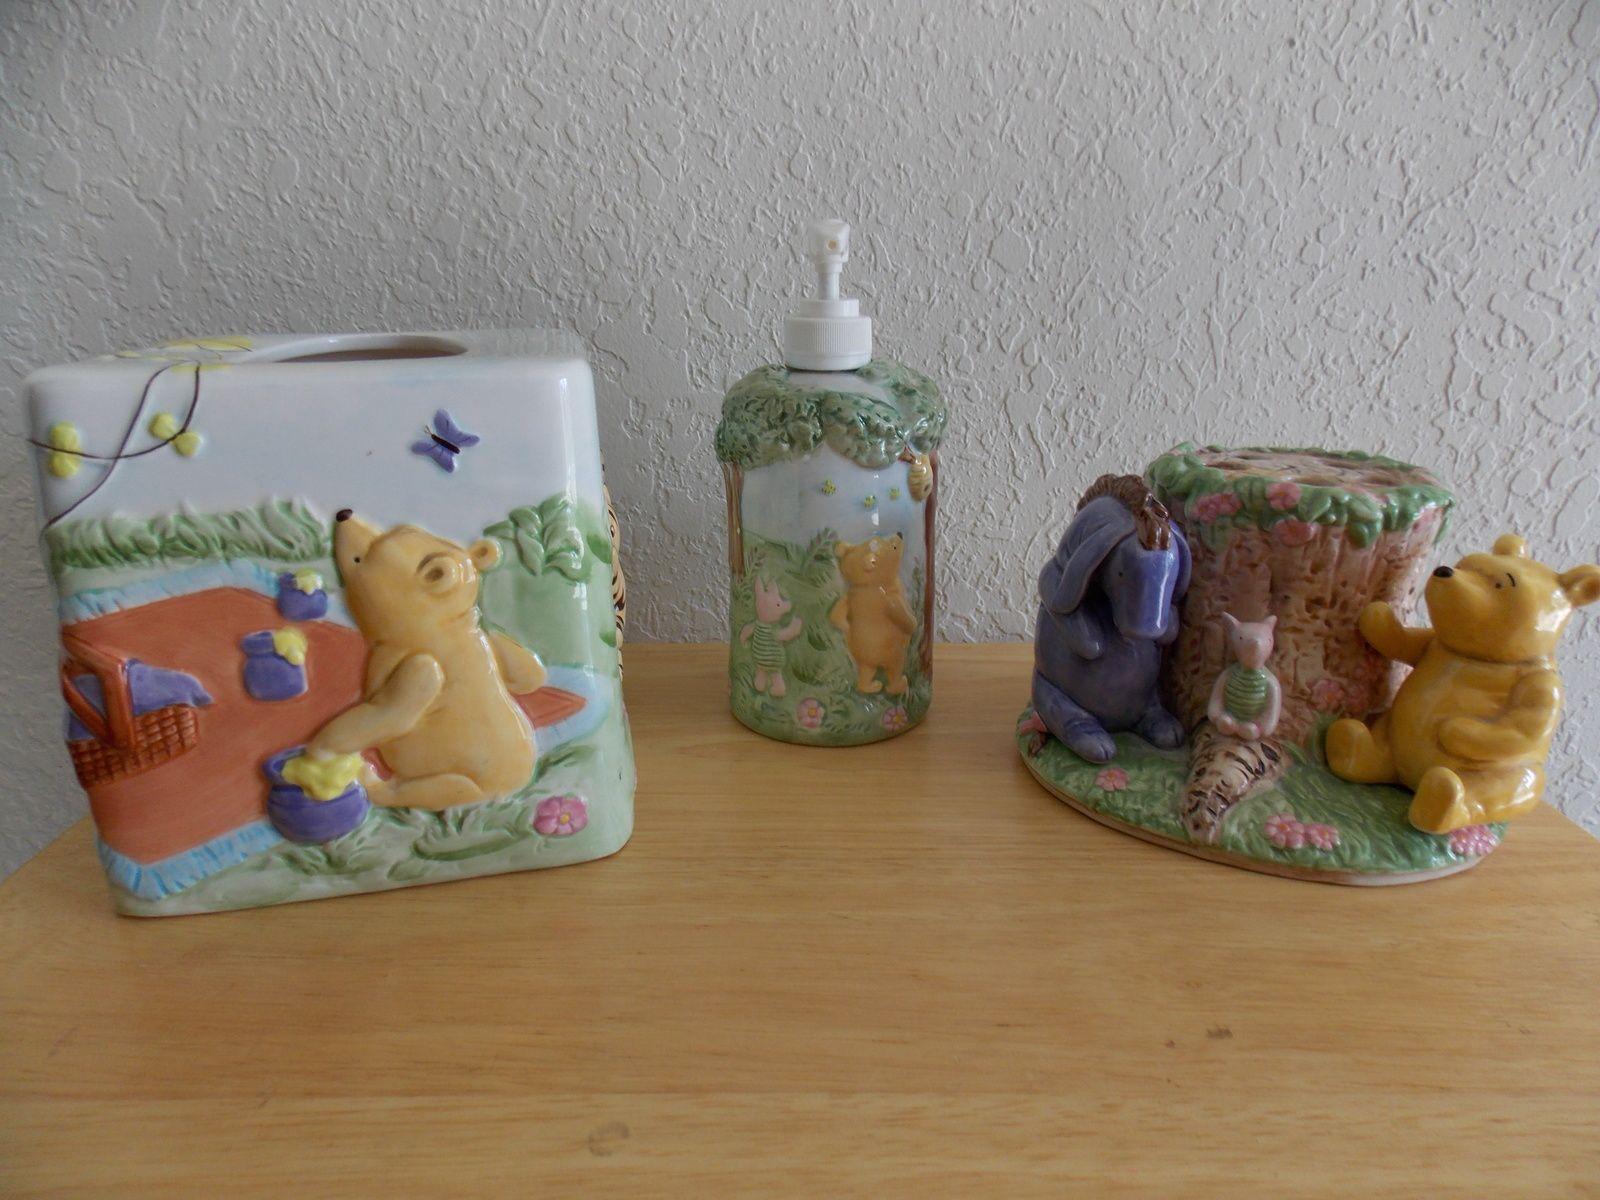 Disney Classic Winnie the Pooh 3pc. Ceramic Bathroom Accs. Set ...